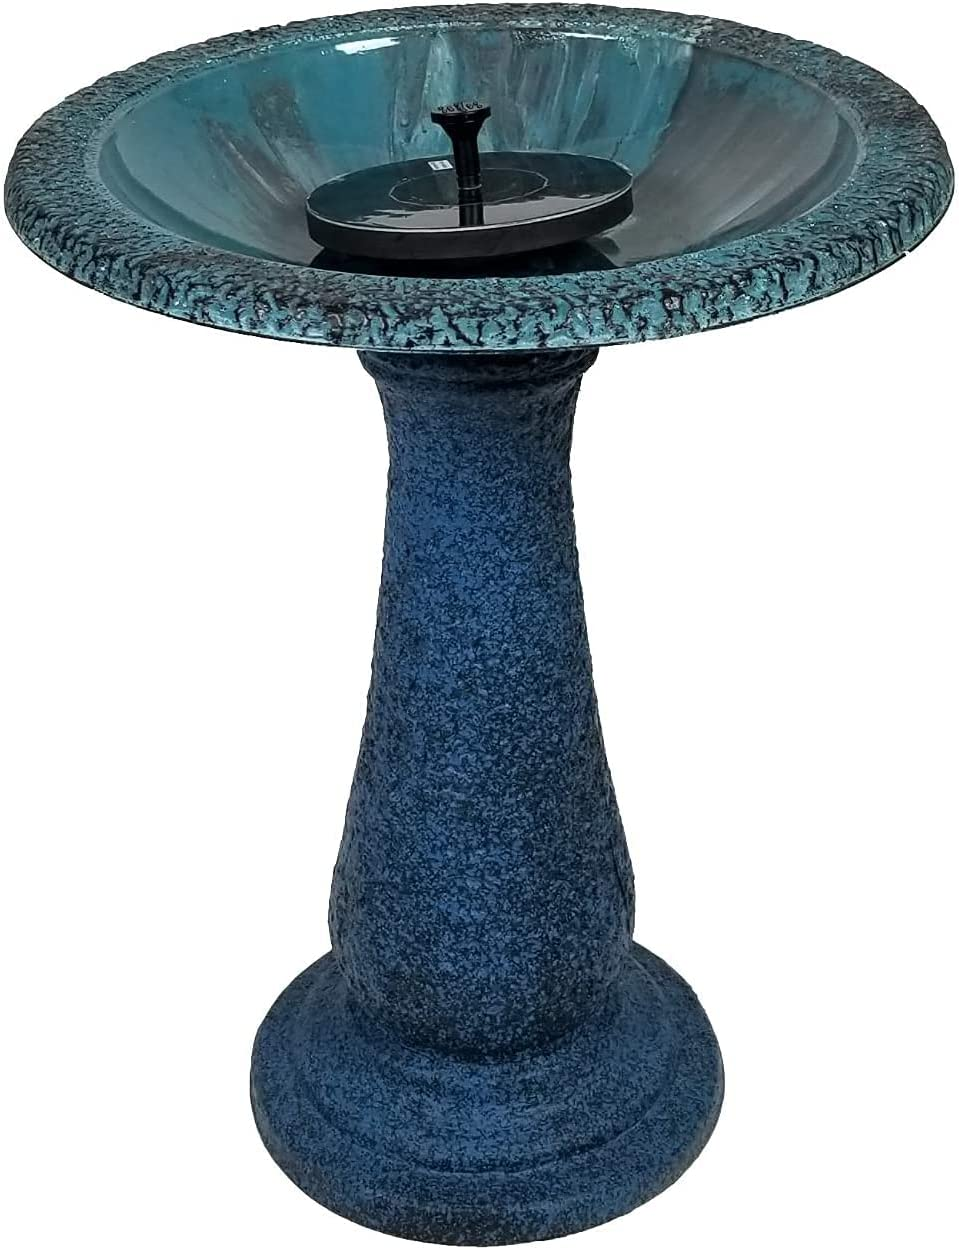 Exaco FM-905RA-NP Solar Ranking TOP14 Pump Fountain Bath Direct stock discount Bird Blue Aqua